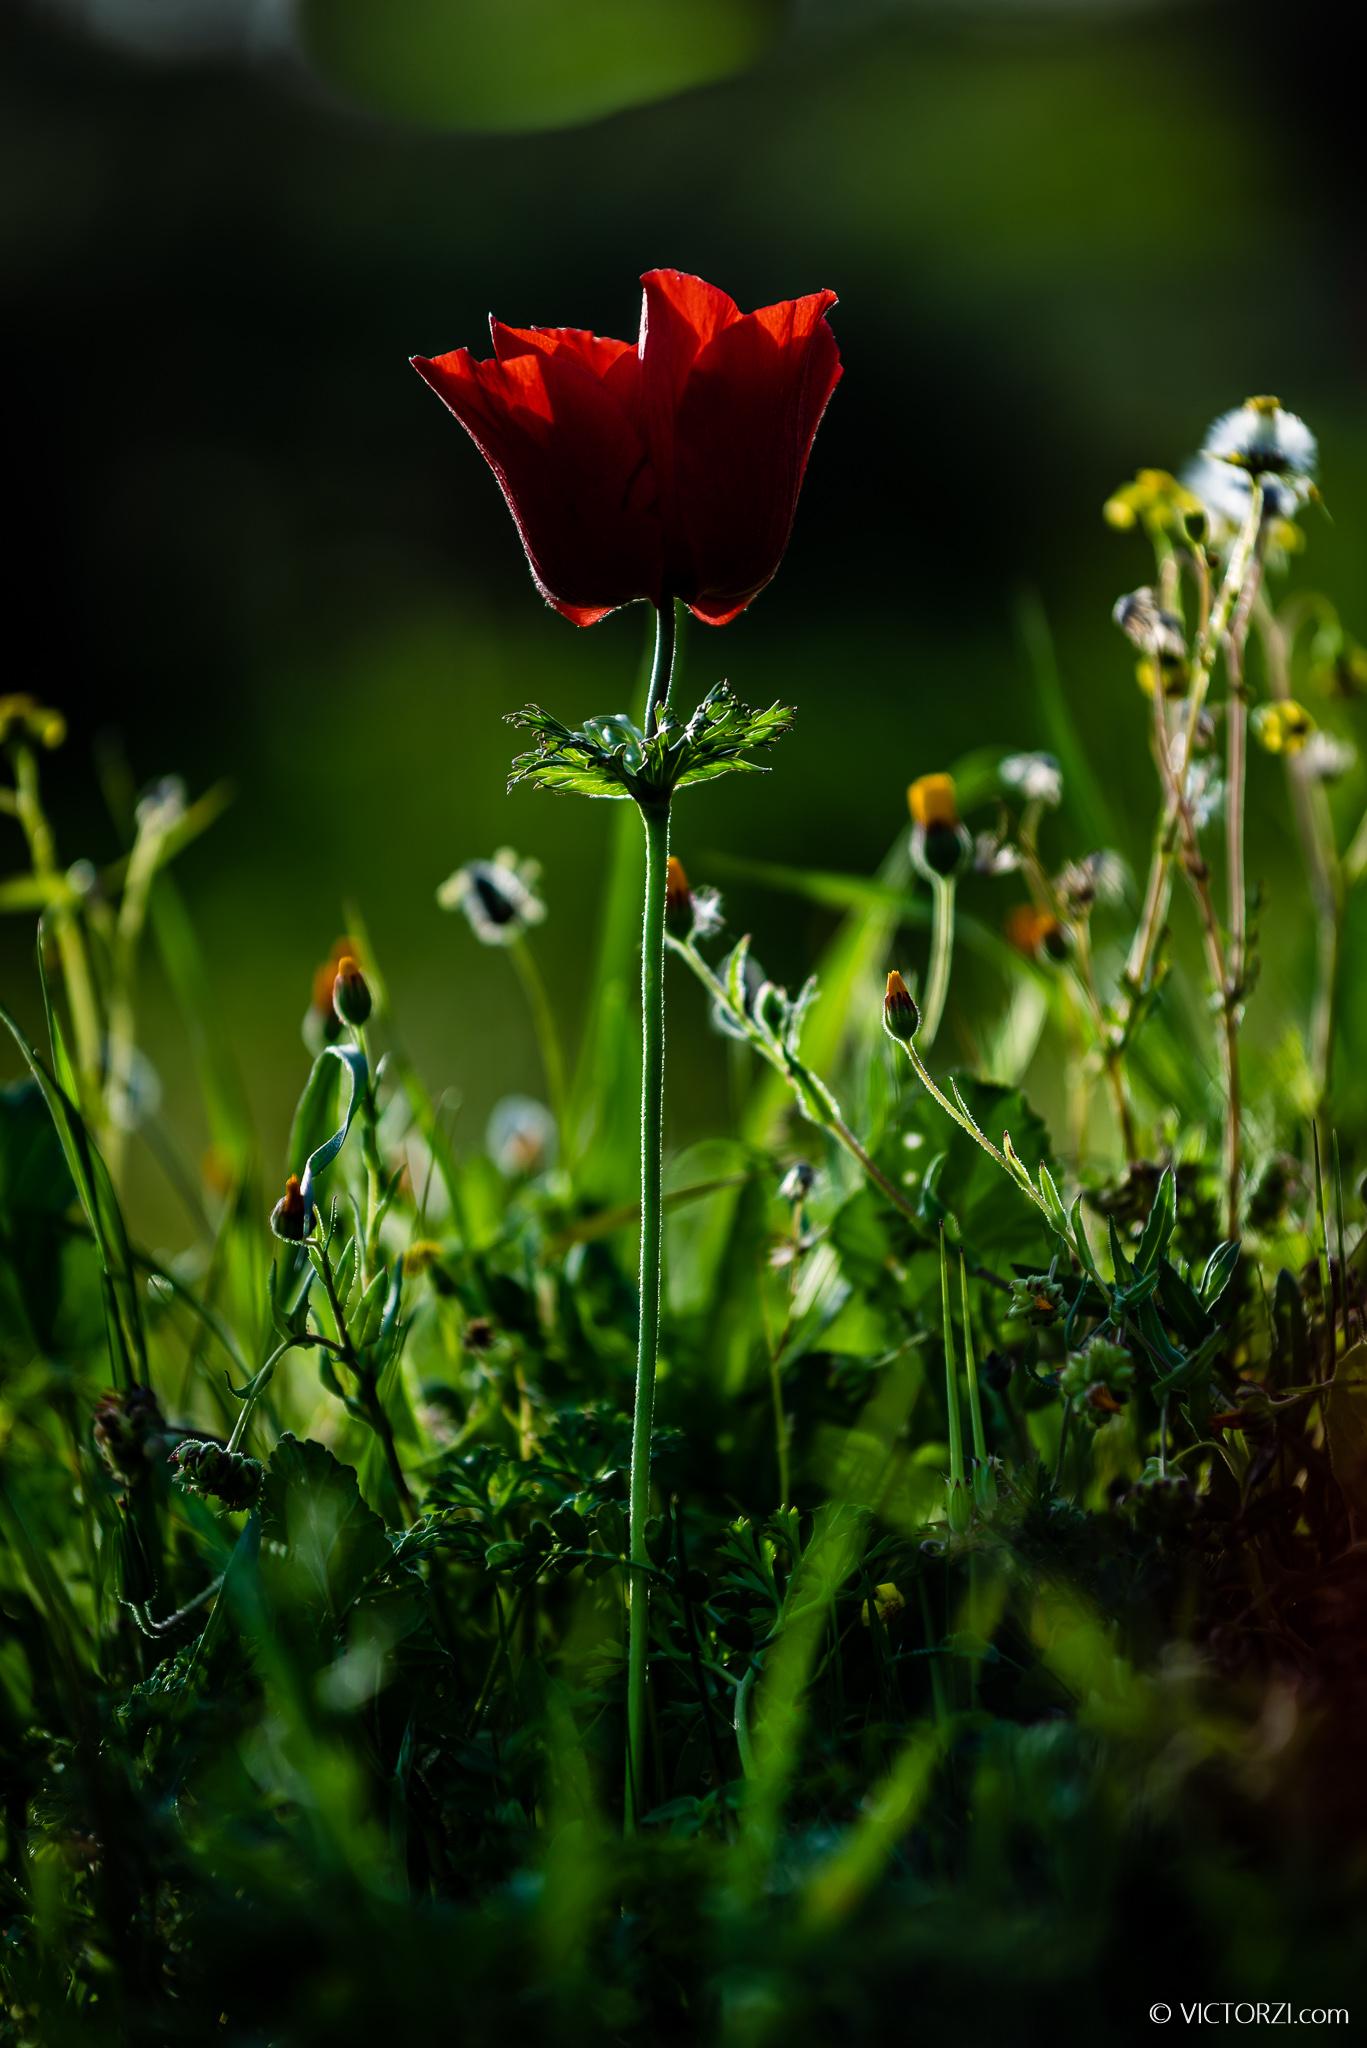 20210202 - Flowers at Emek Haela - 08440